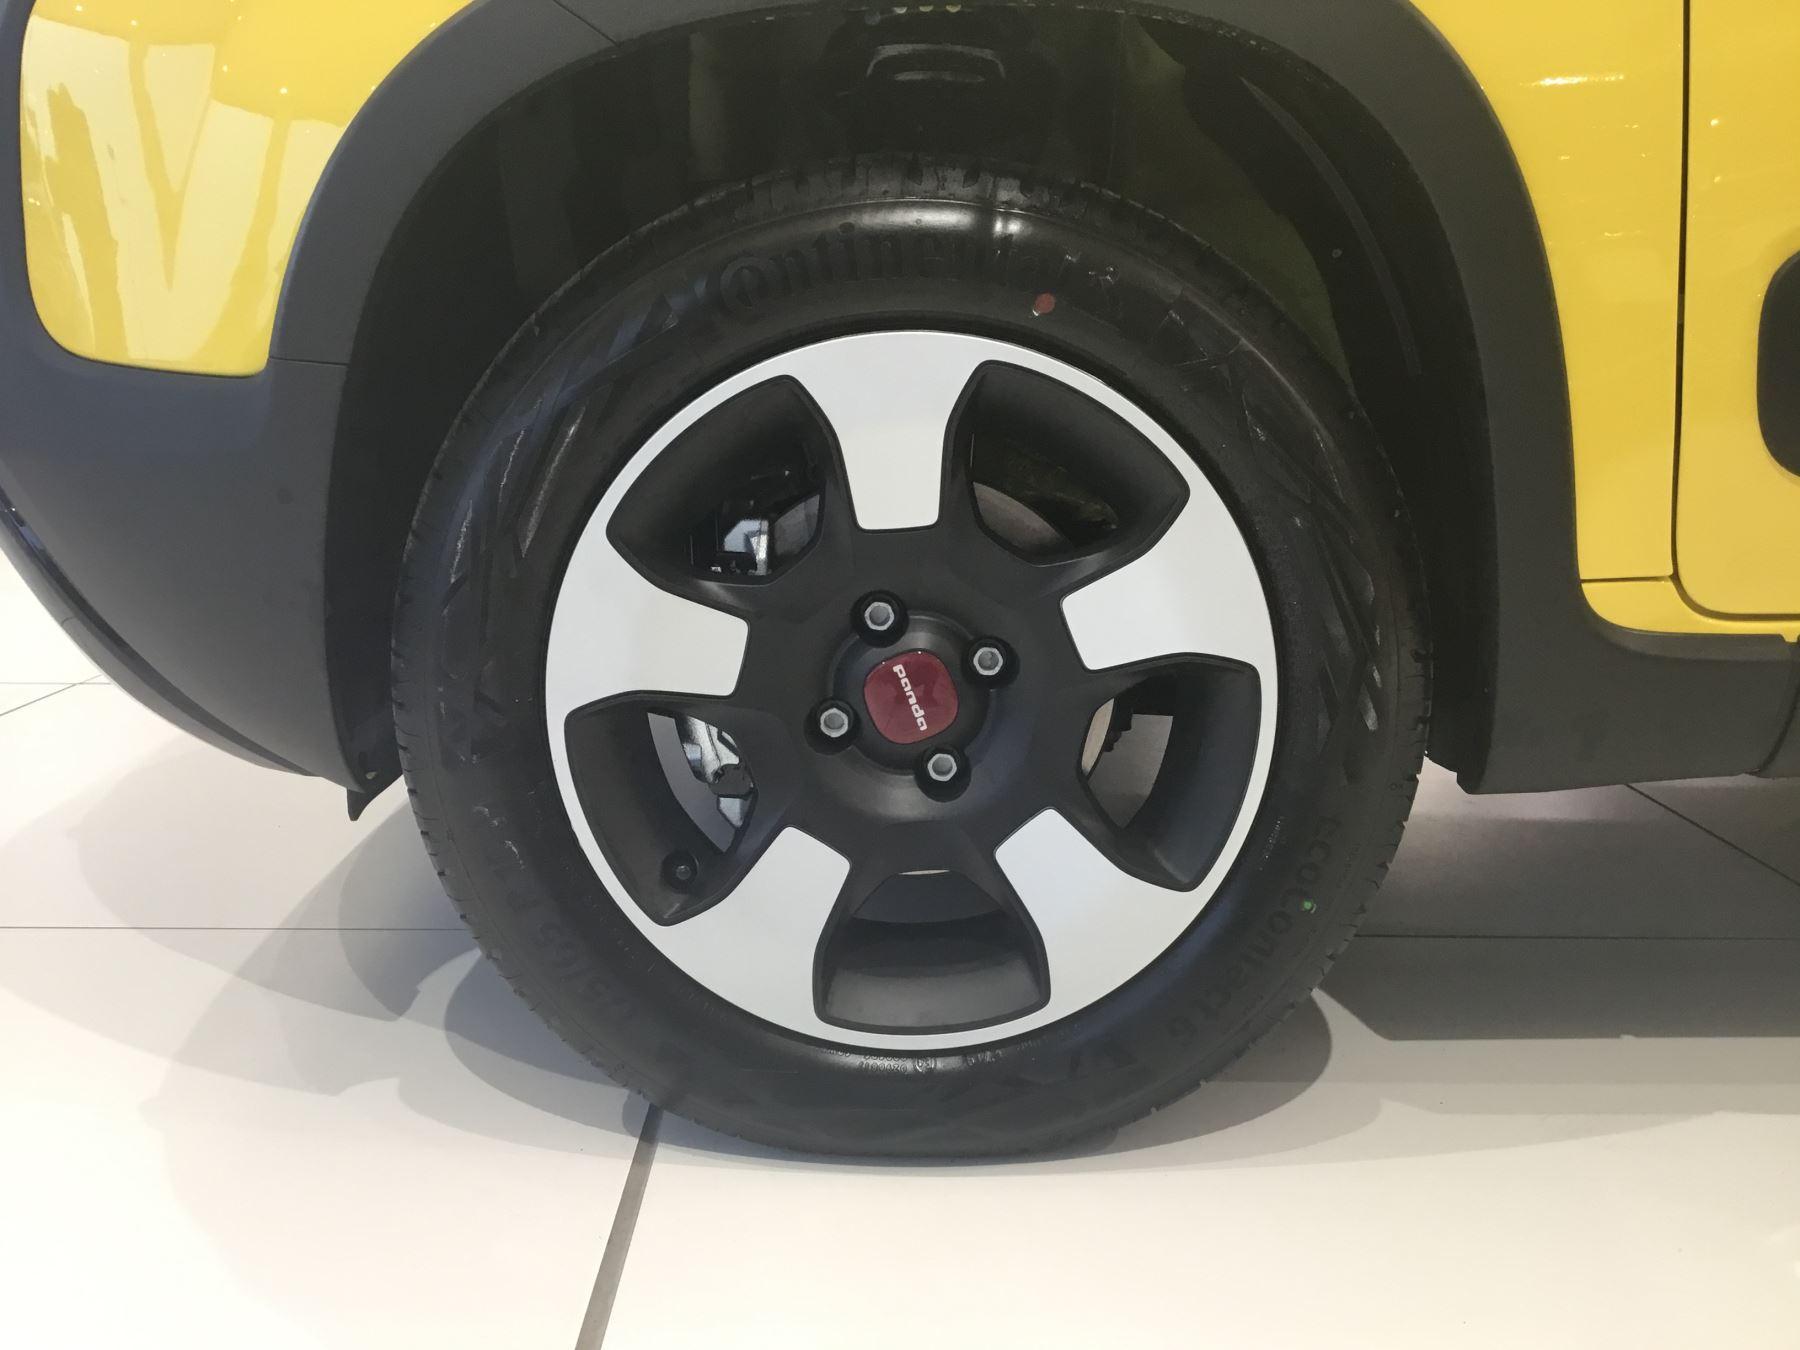 Fiat Panda 1.2 Waze SPECIAL EDITIONS image 2